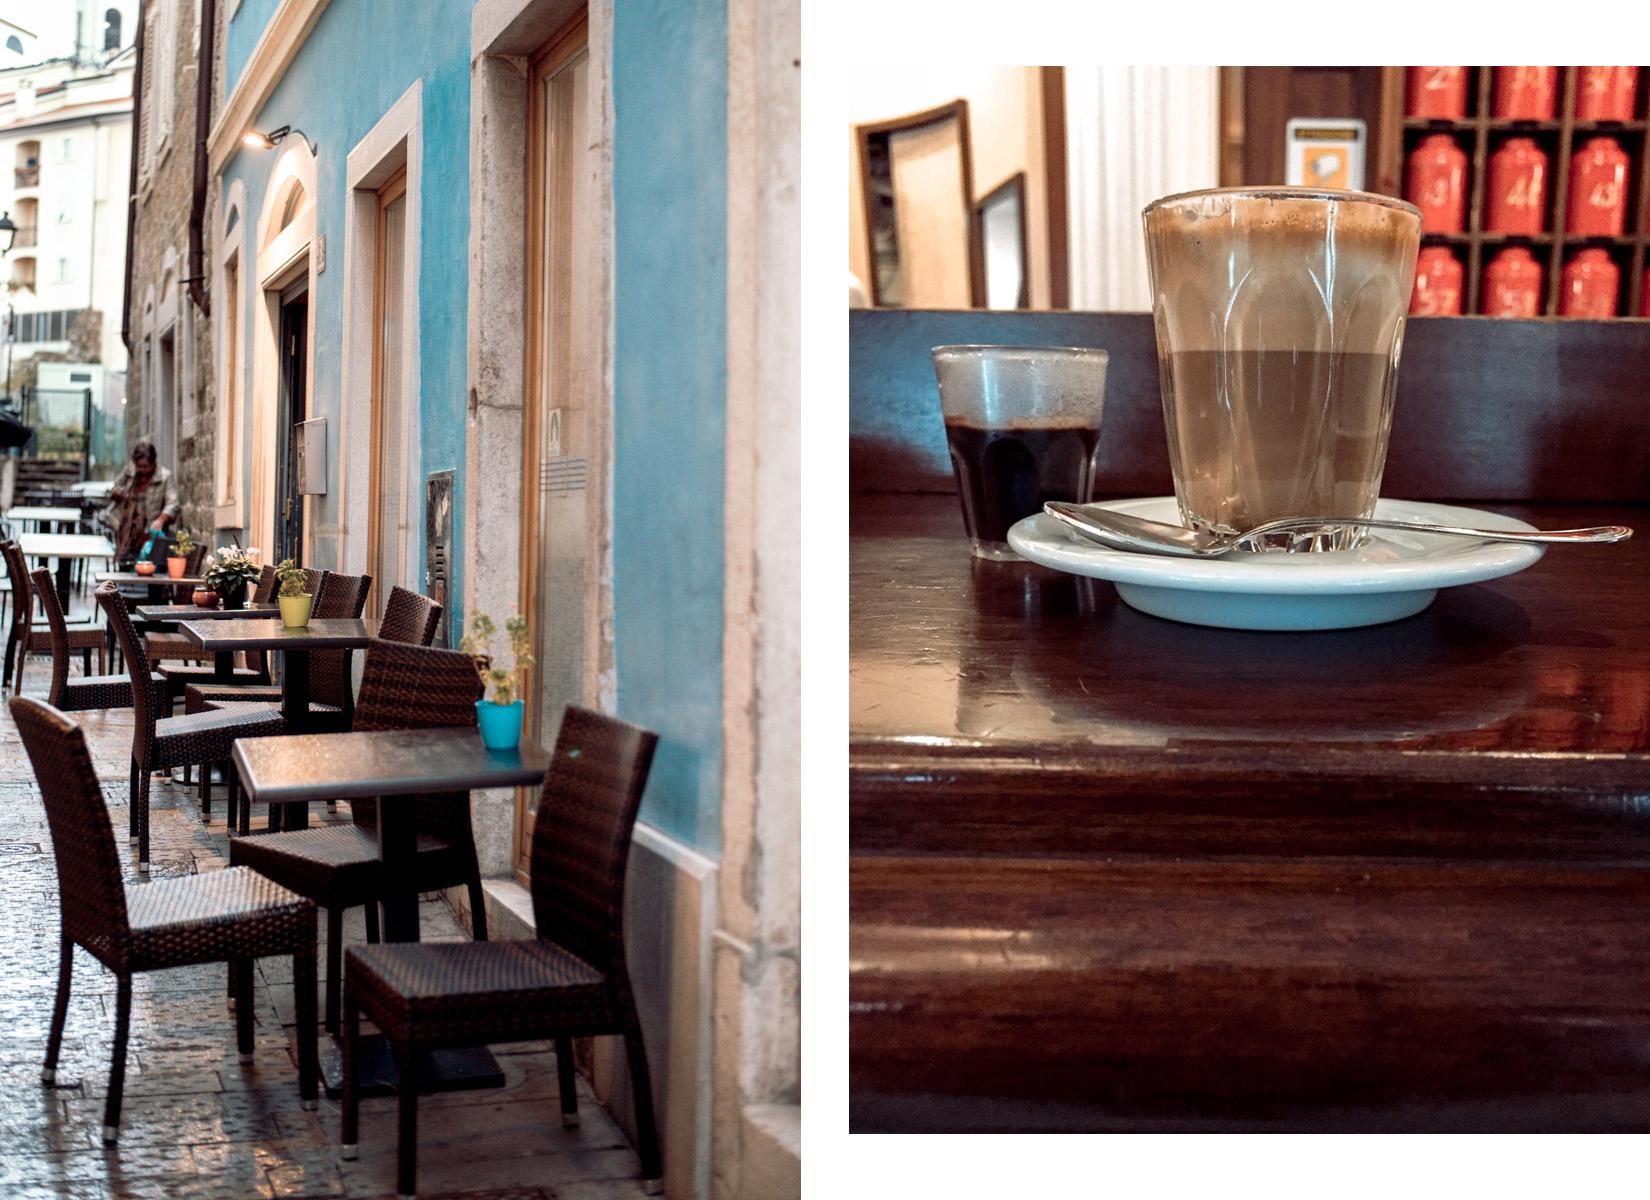 A narrow street in Trieste with dark tables and blue walls and a cofee in a bar - Una stradina stretta di Trieste con tavolini scuri e muri blu e un caffè in un bar